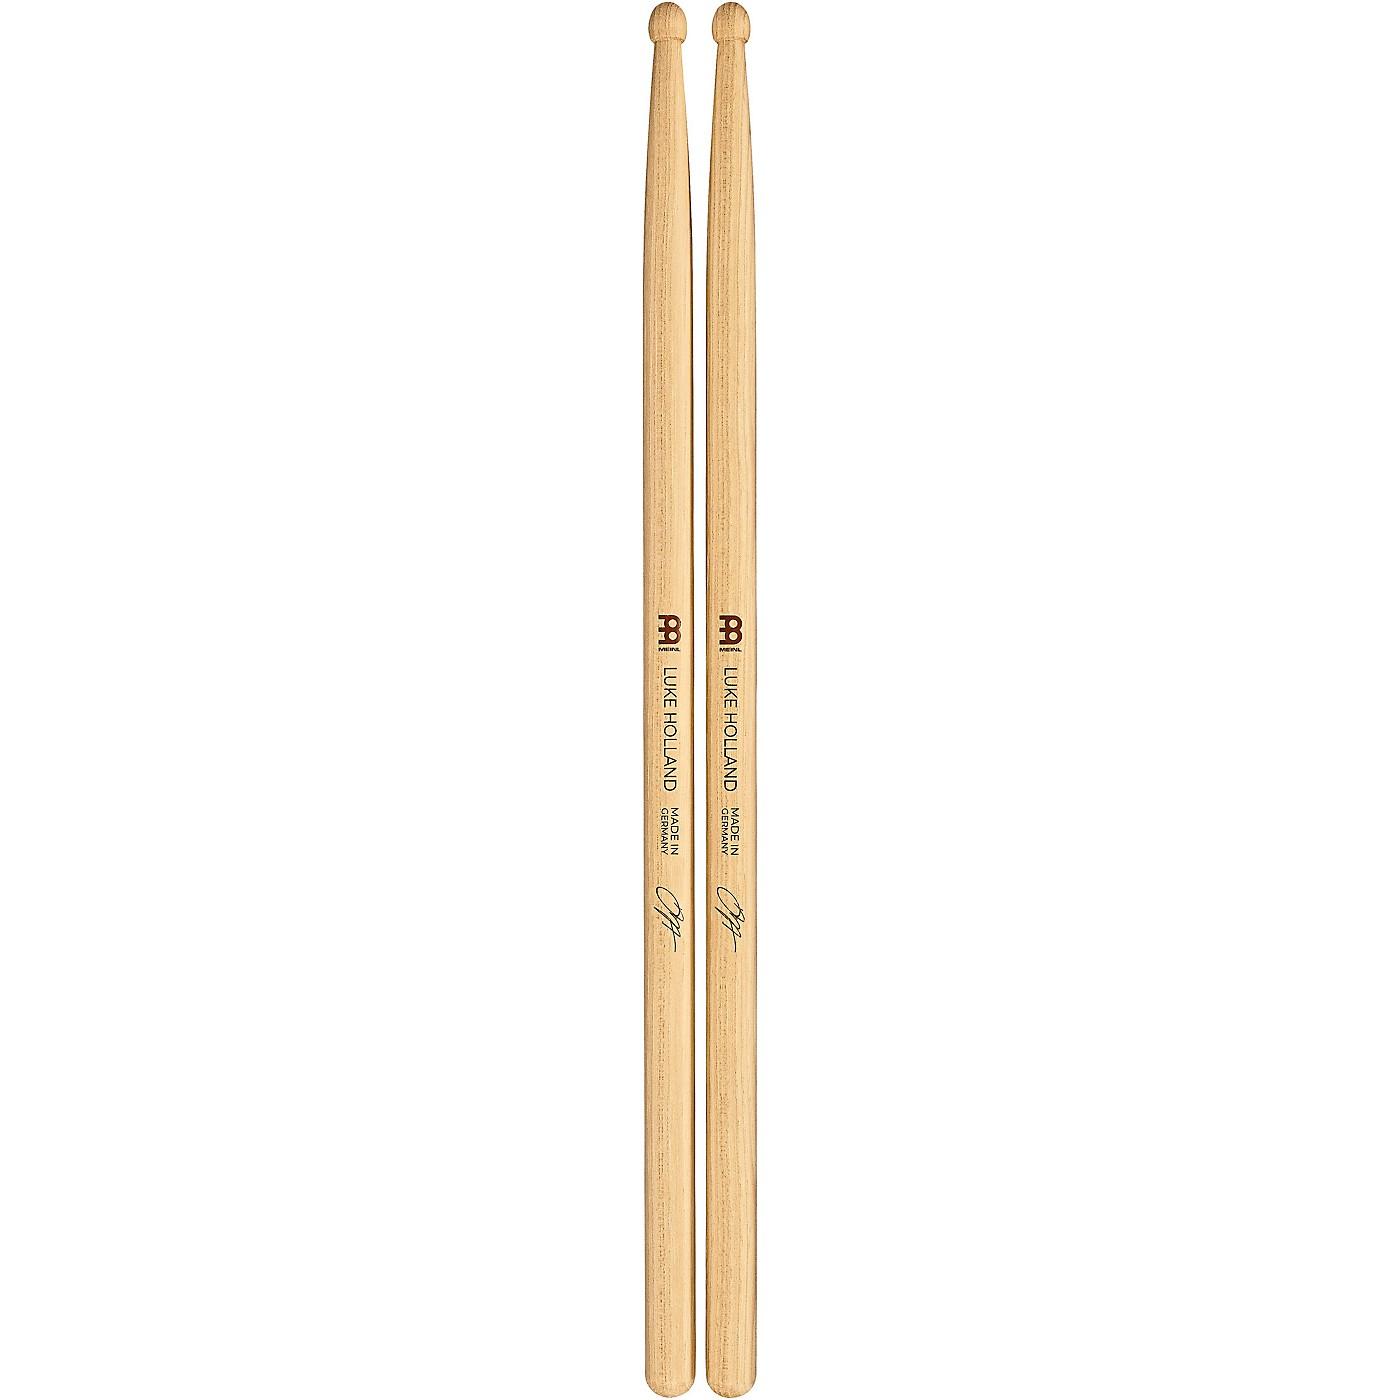 Meinl Stick & Brush Luke Holland Signature Drumsticks thumbnail